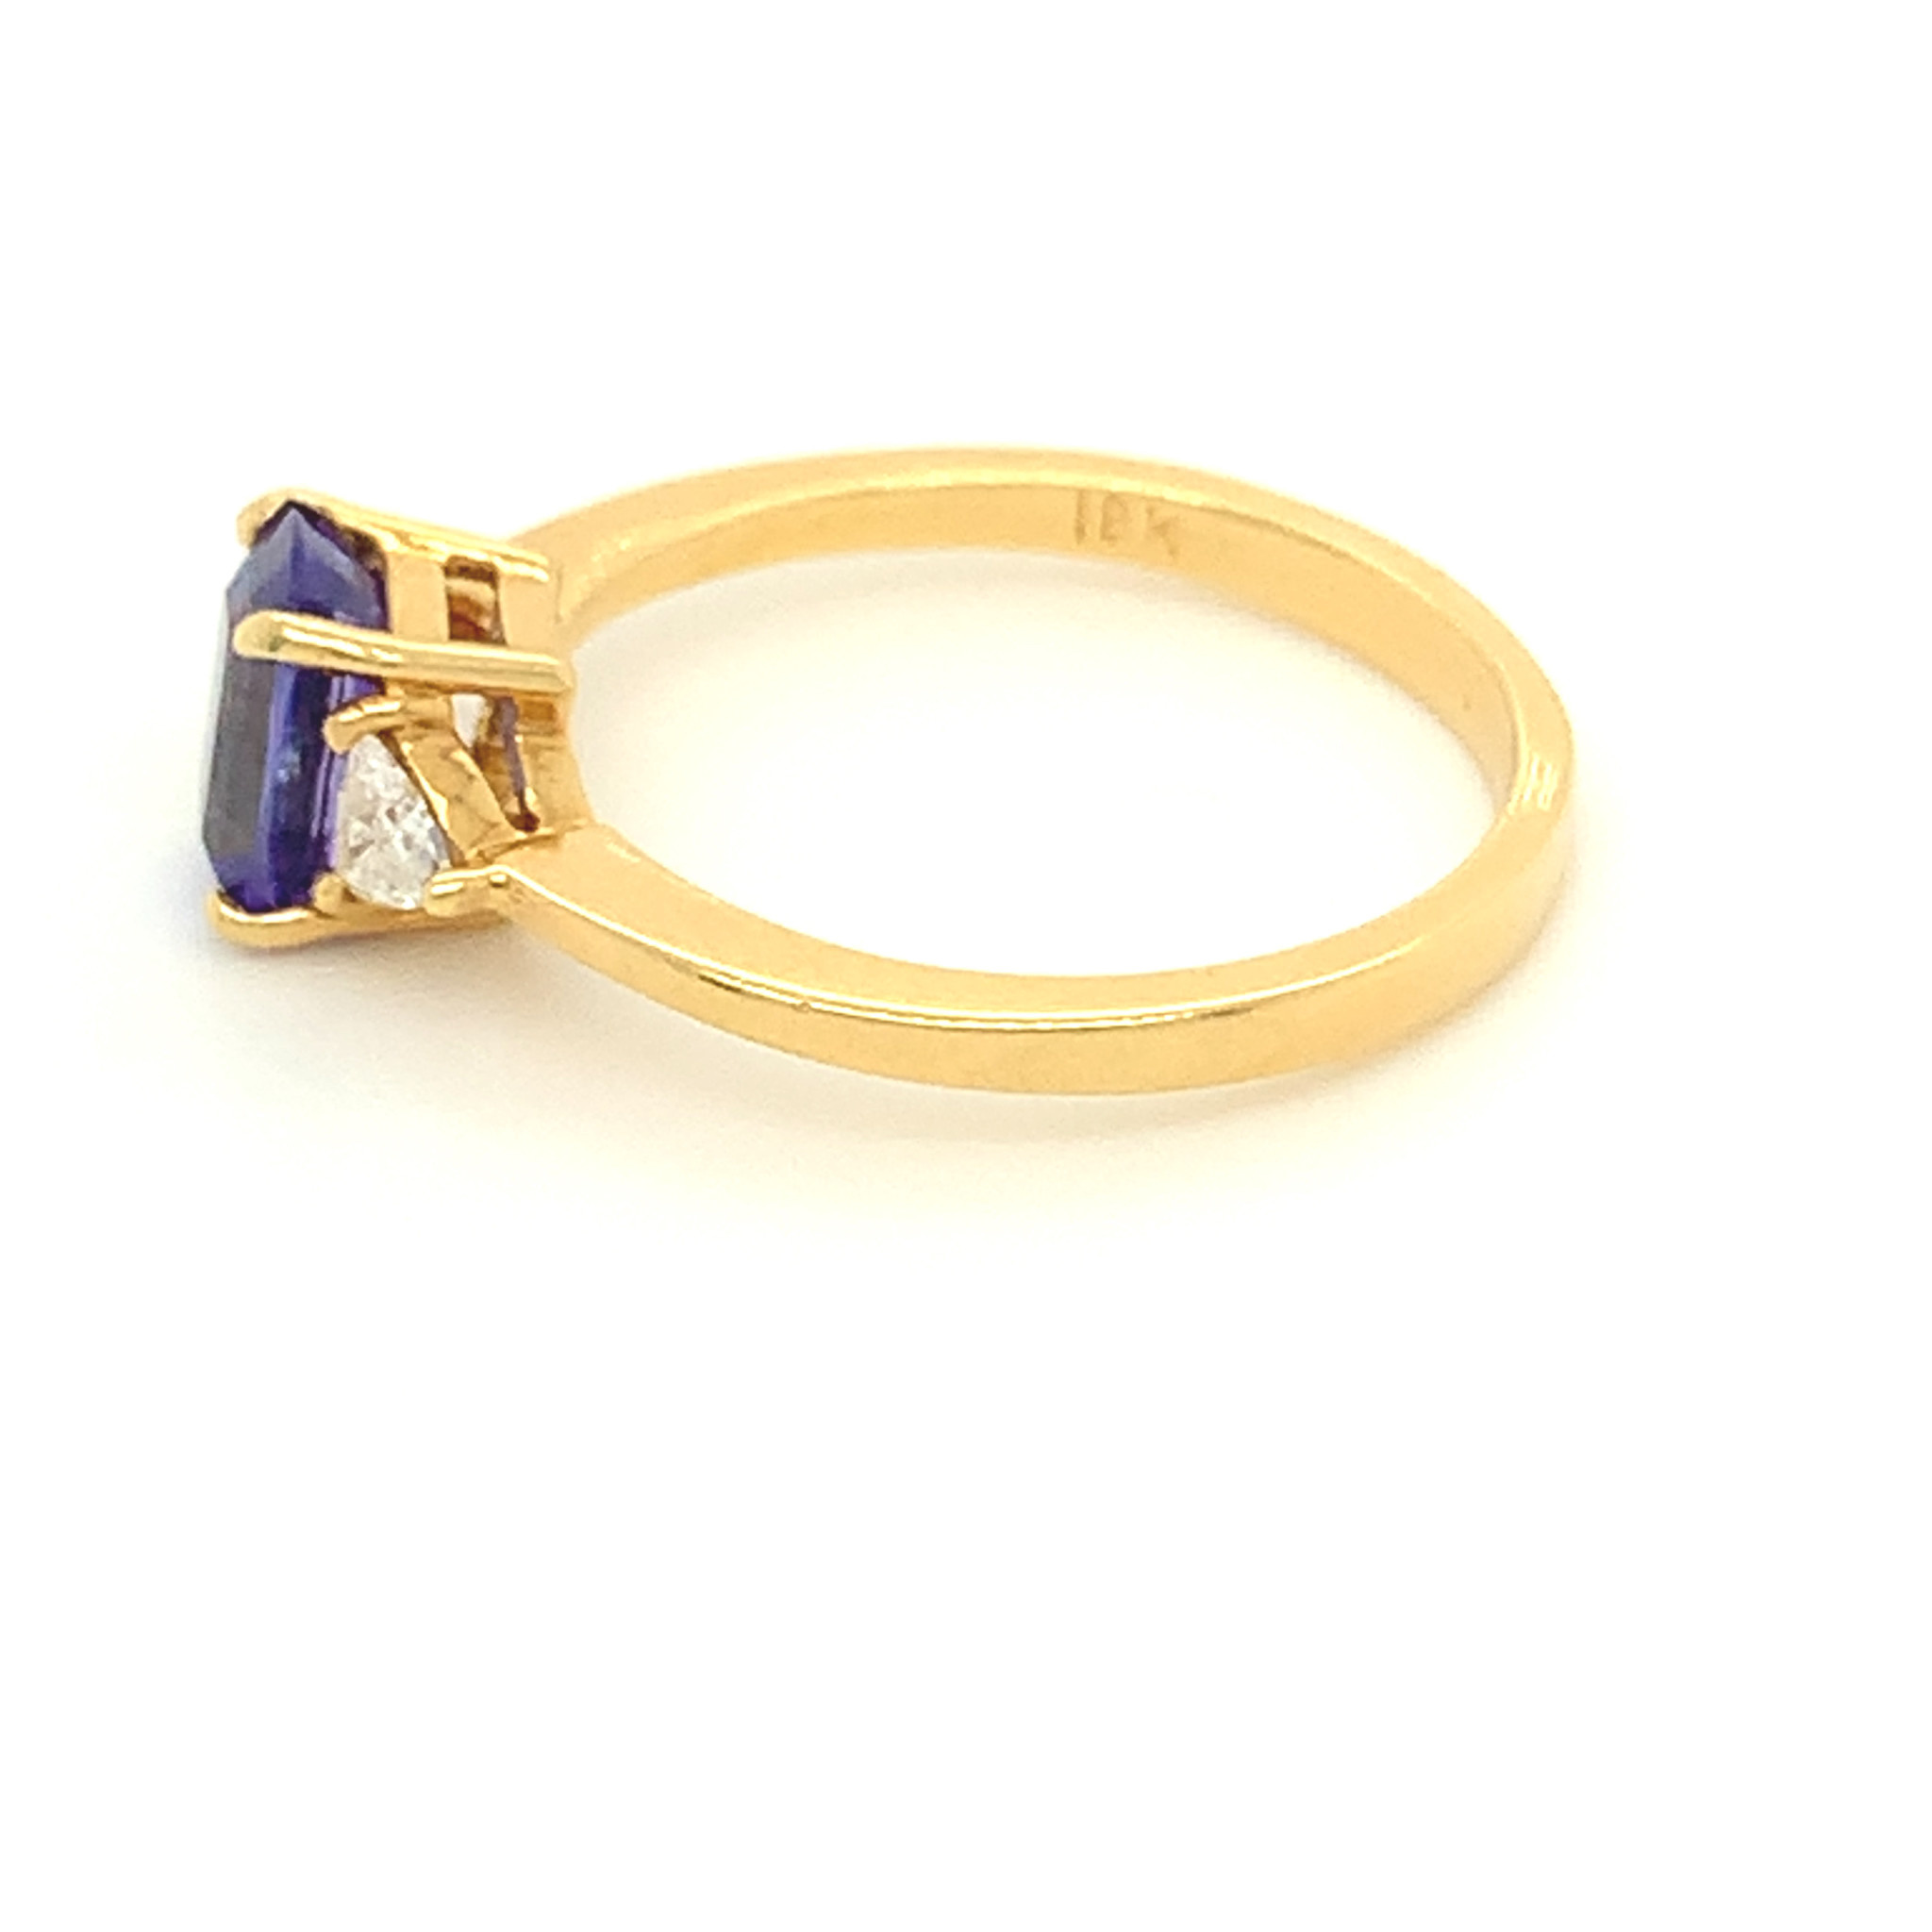 Freedman 18kt yellow gold Tanzanite & Diamond 3 stone Ring